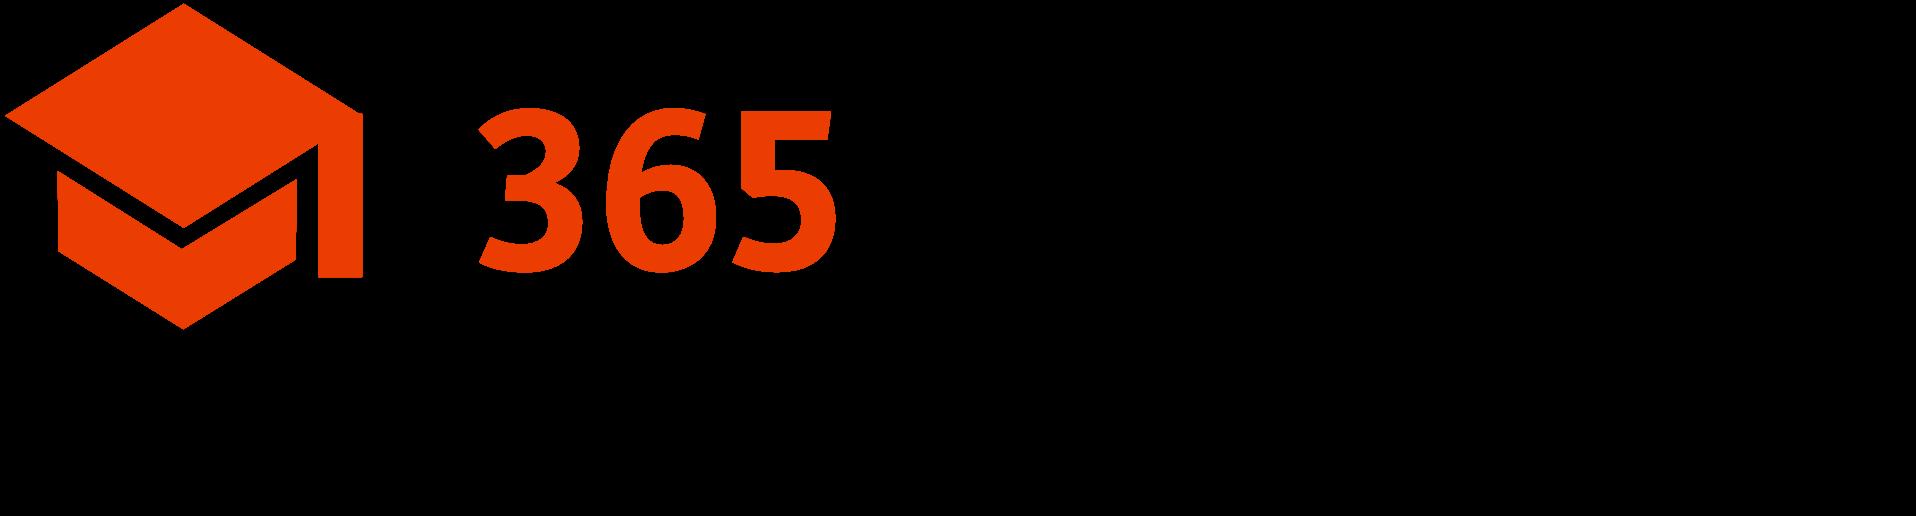 365 Akademie